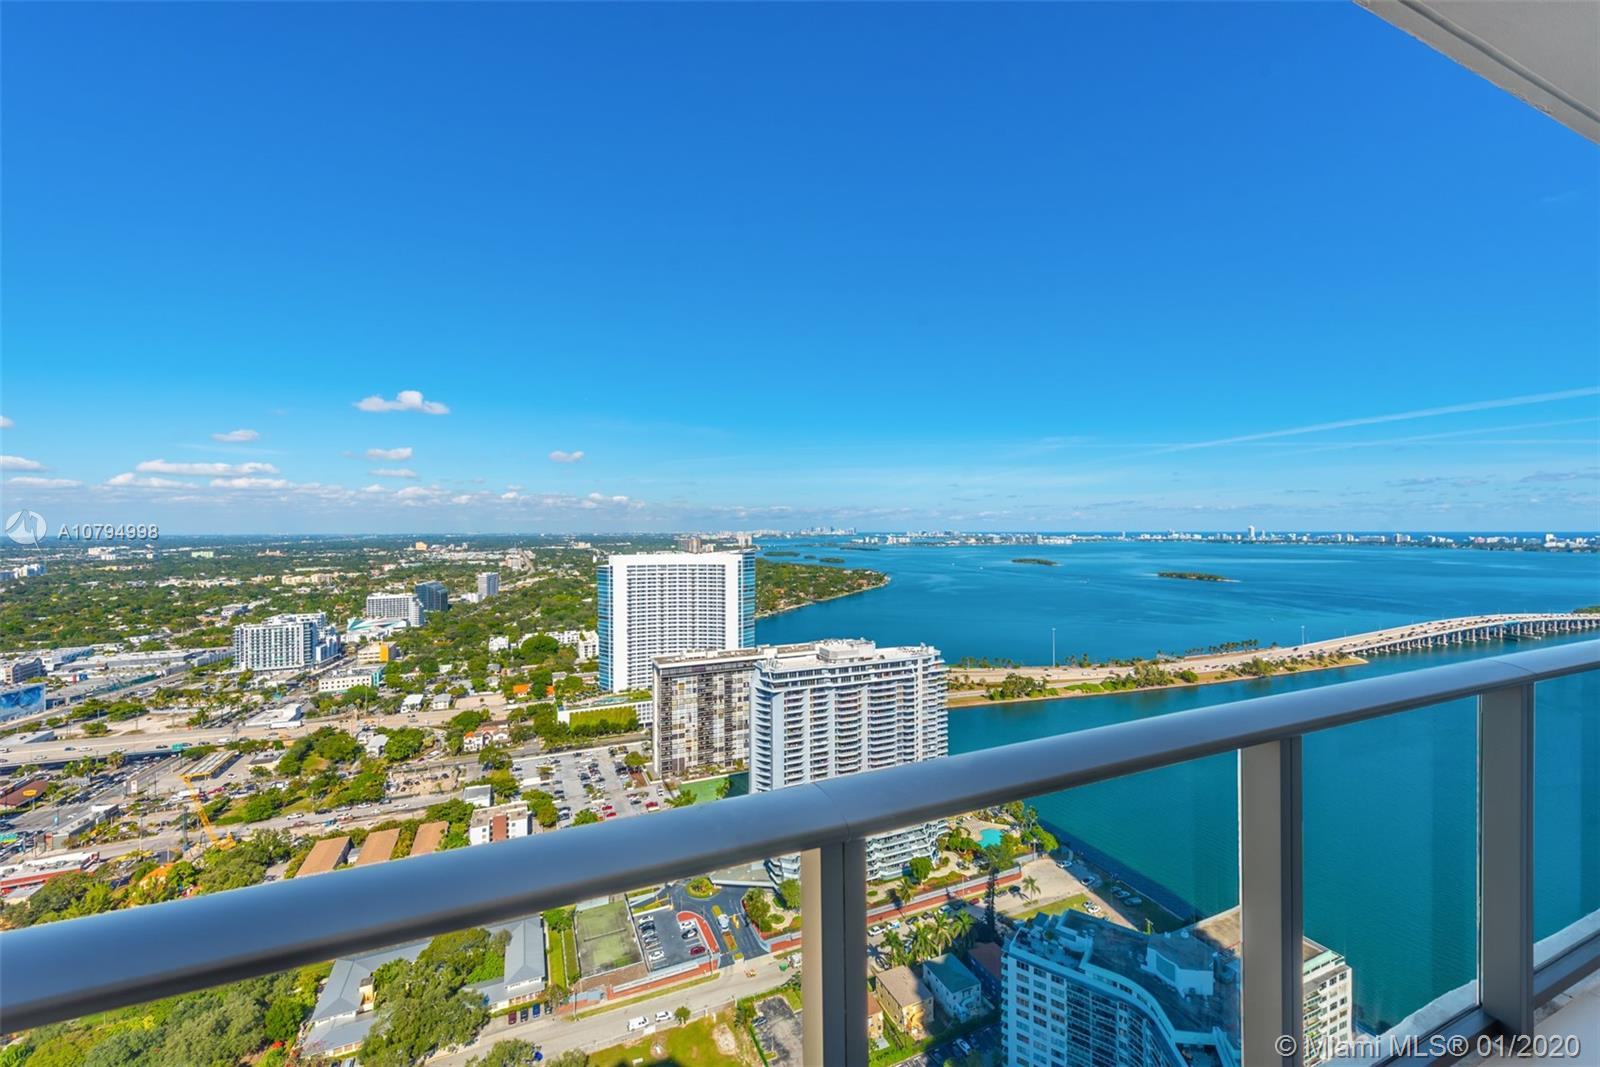 501 NE 31st St, PH4301 - Miami, Florida